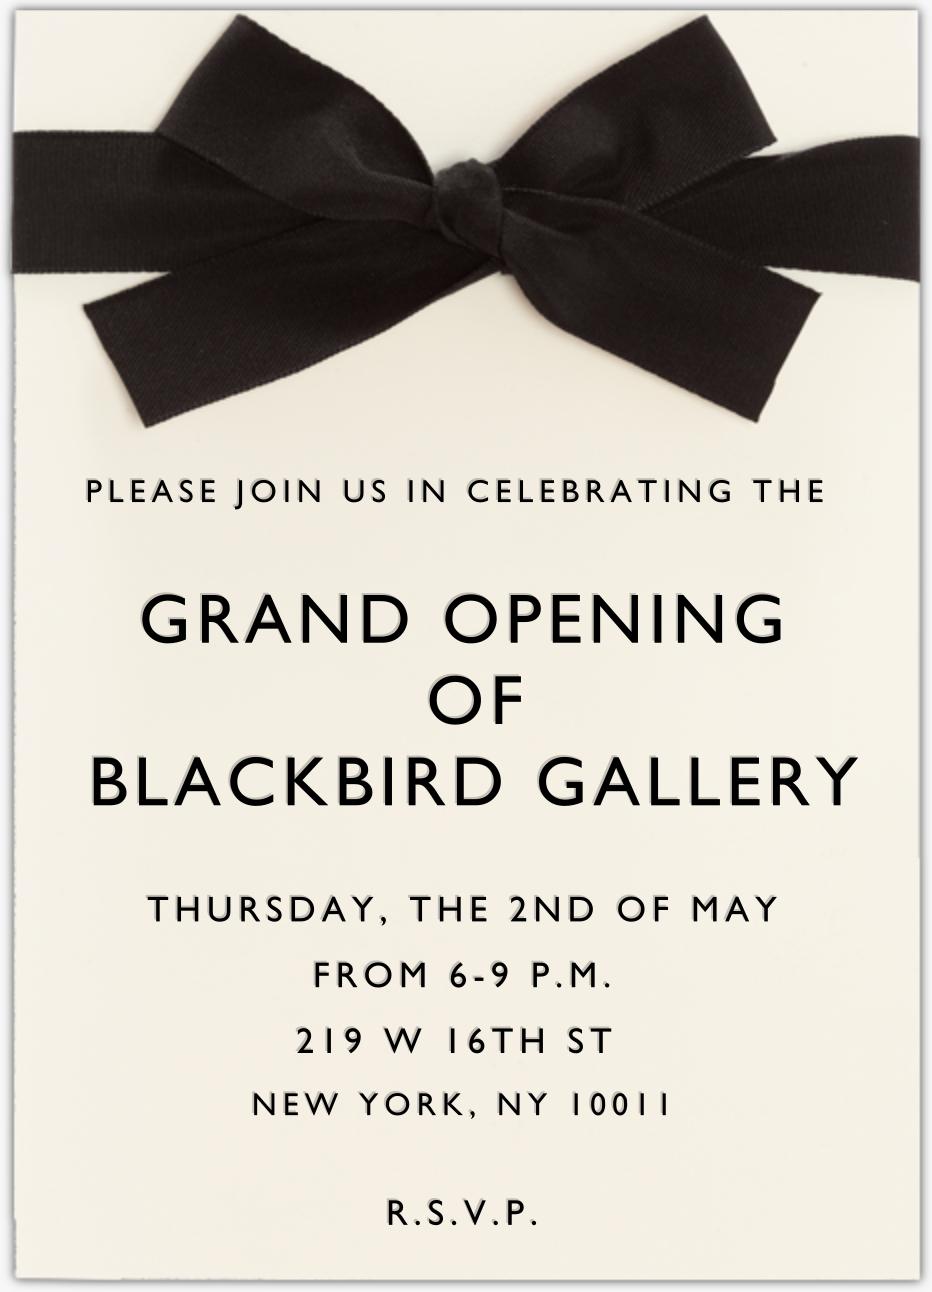 Blackbird Gallery Opening Invitation.png